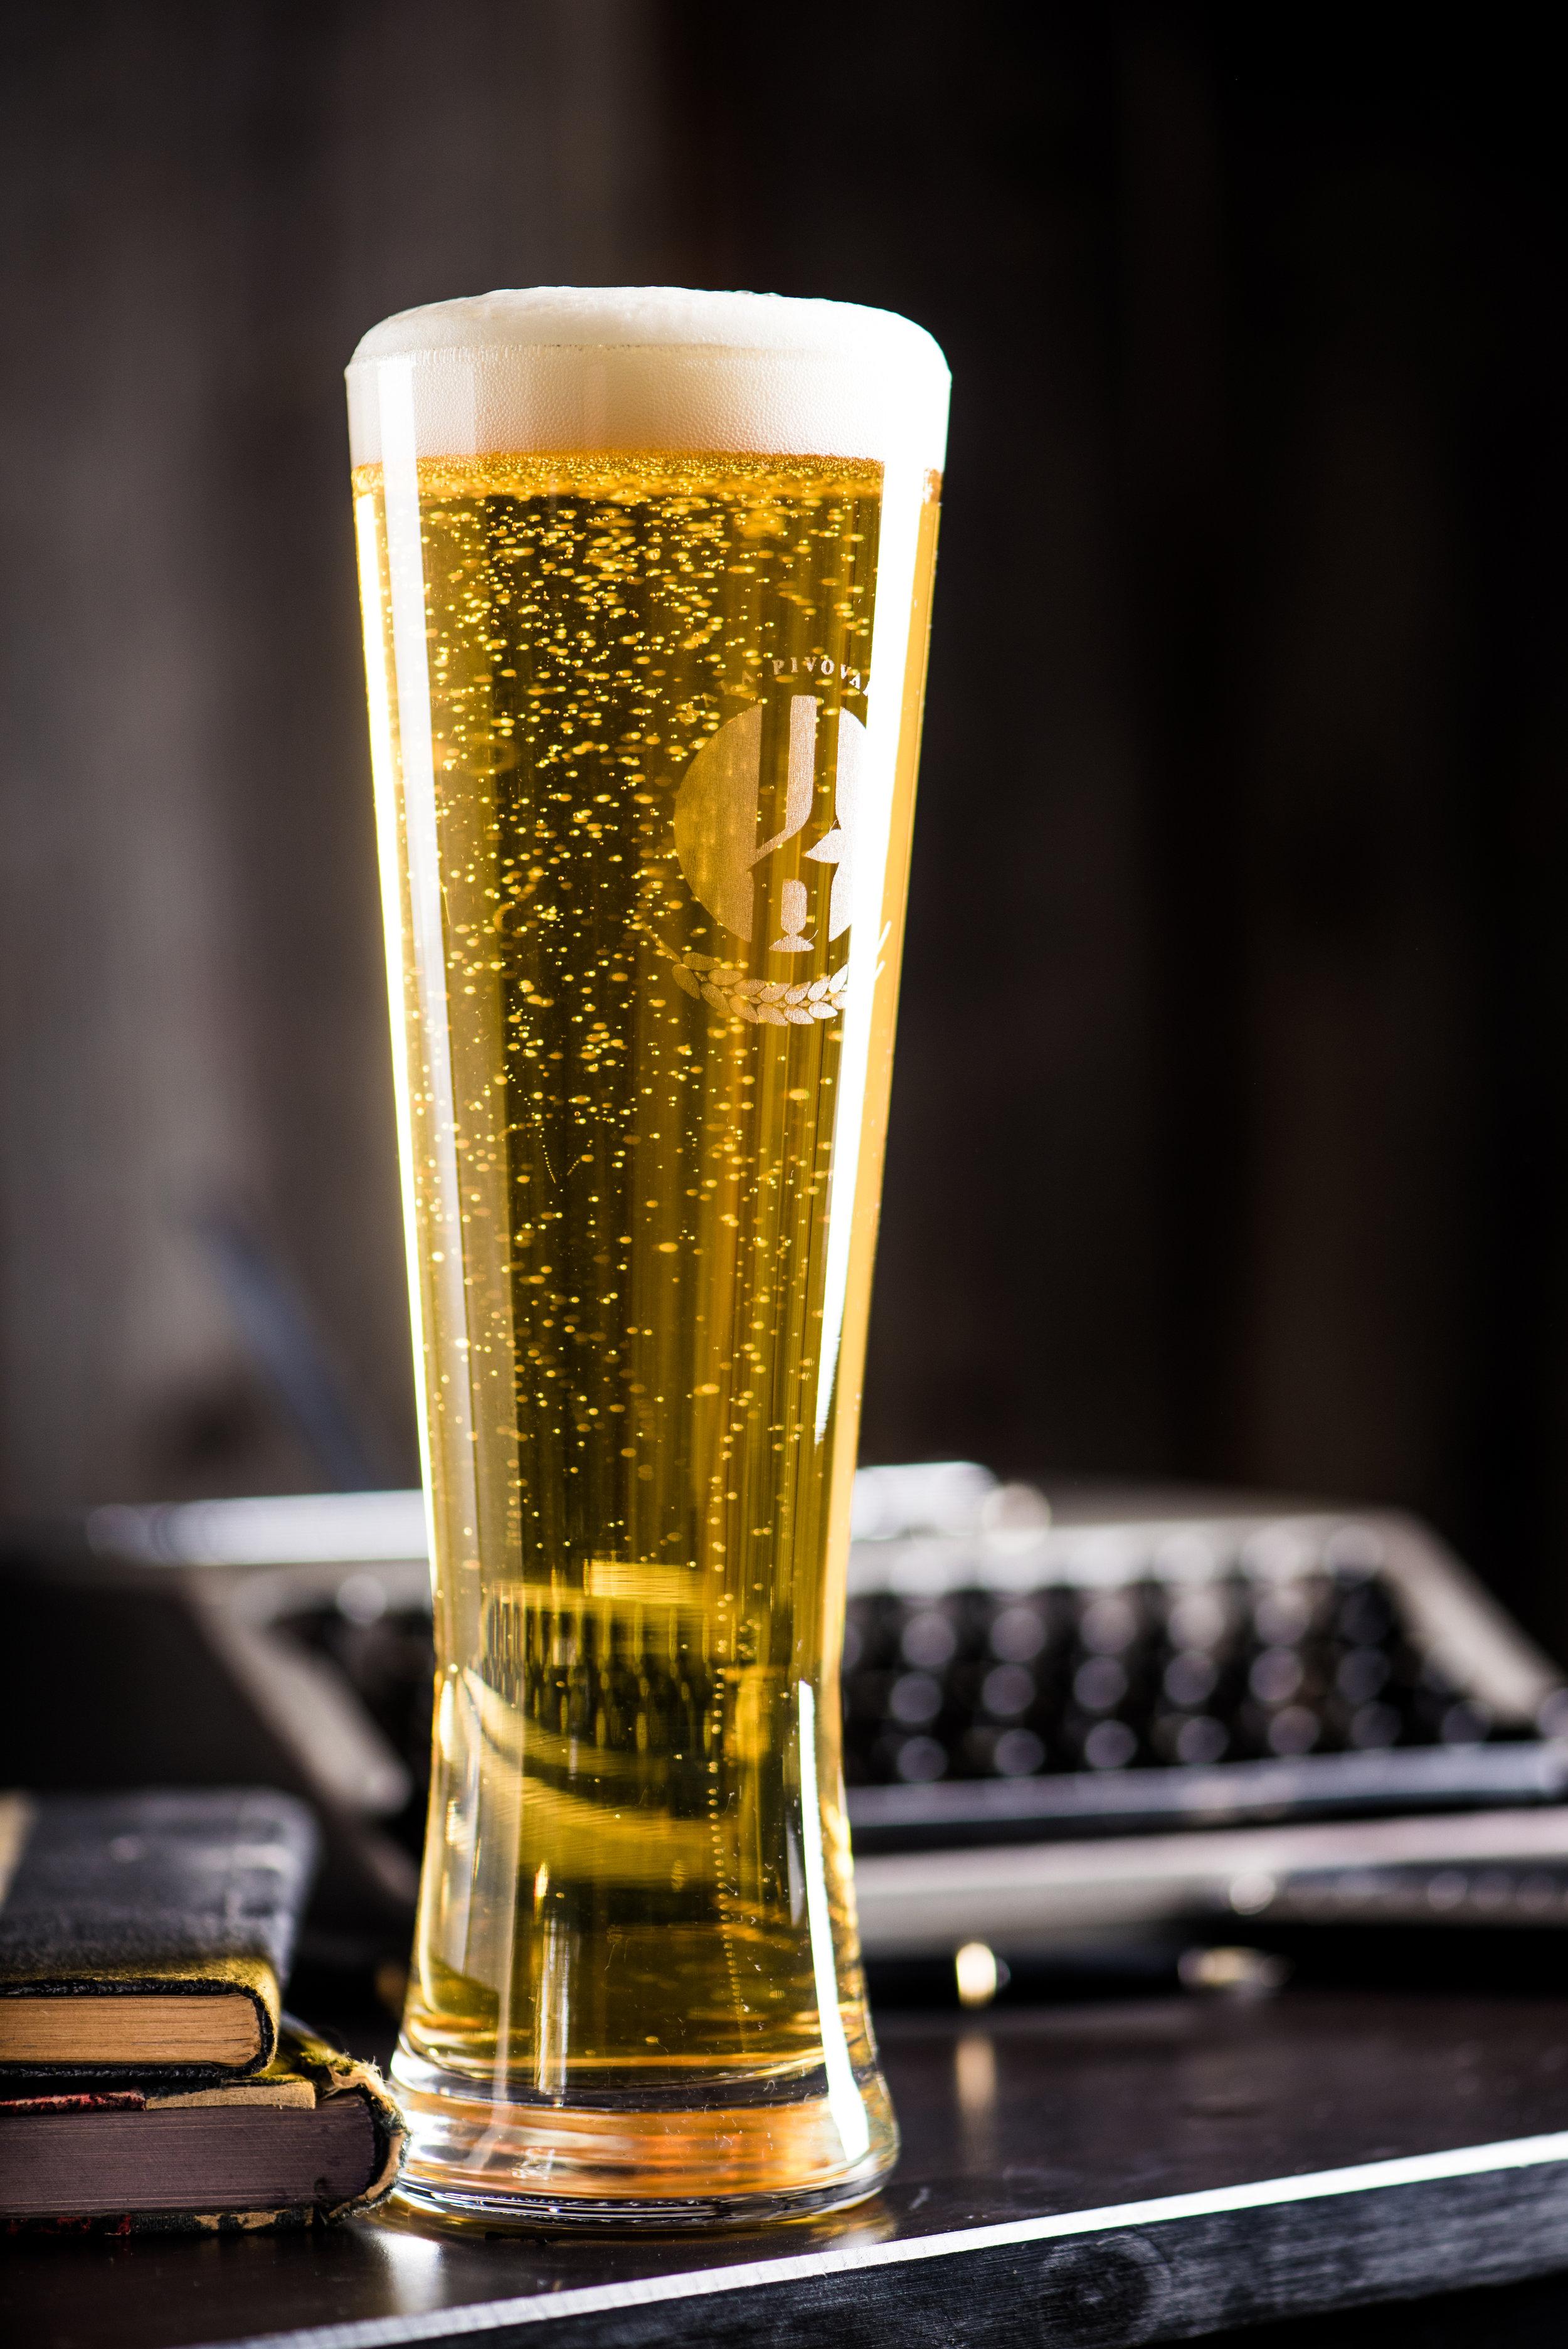 Kajtimar toceno pivo 20.4.2018 export petezakrajsek.com-1.jpg